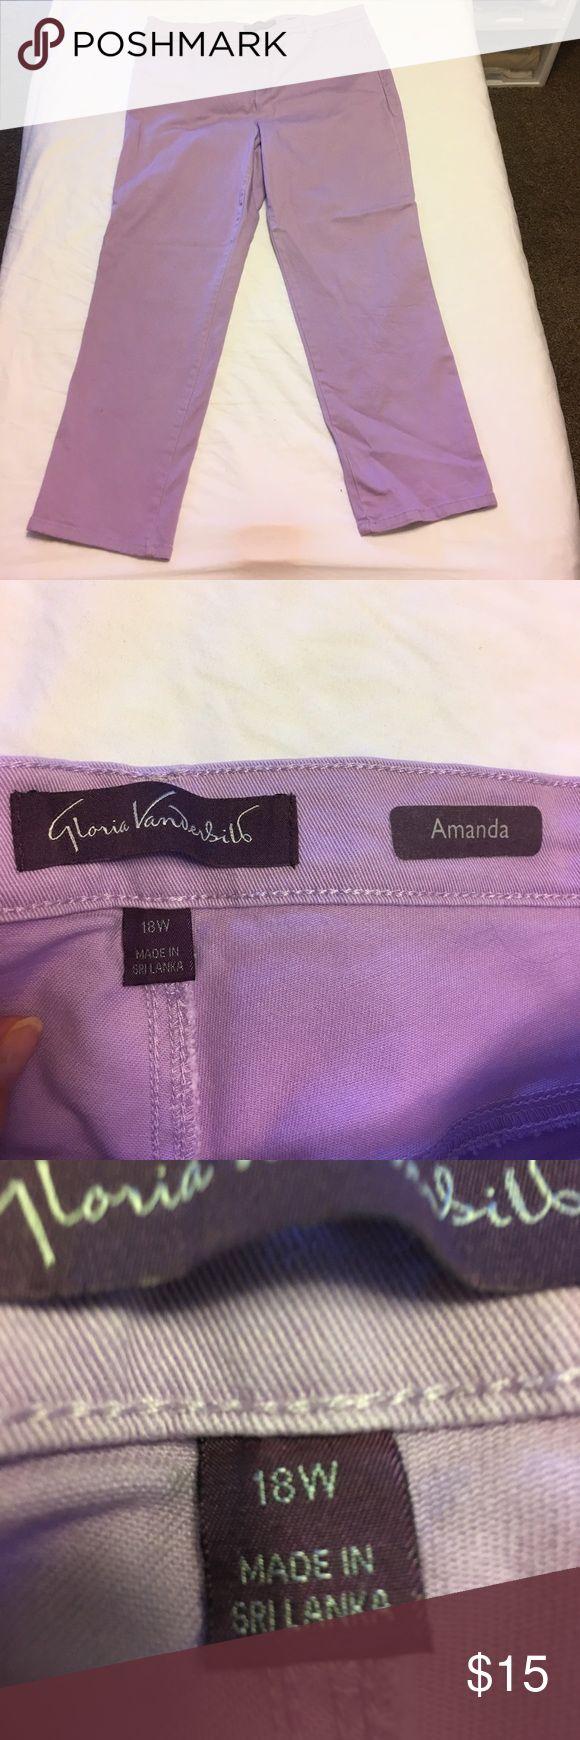 Women's jeans Gloria Vanderbilt women's size 18 light purple jeans Gloria Vanderbilt Jeans